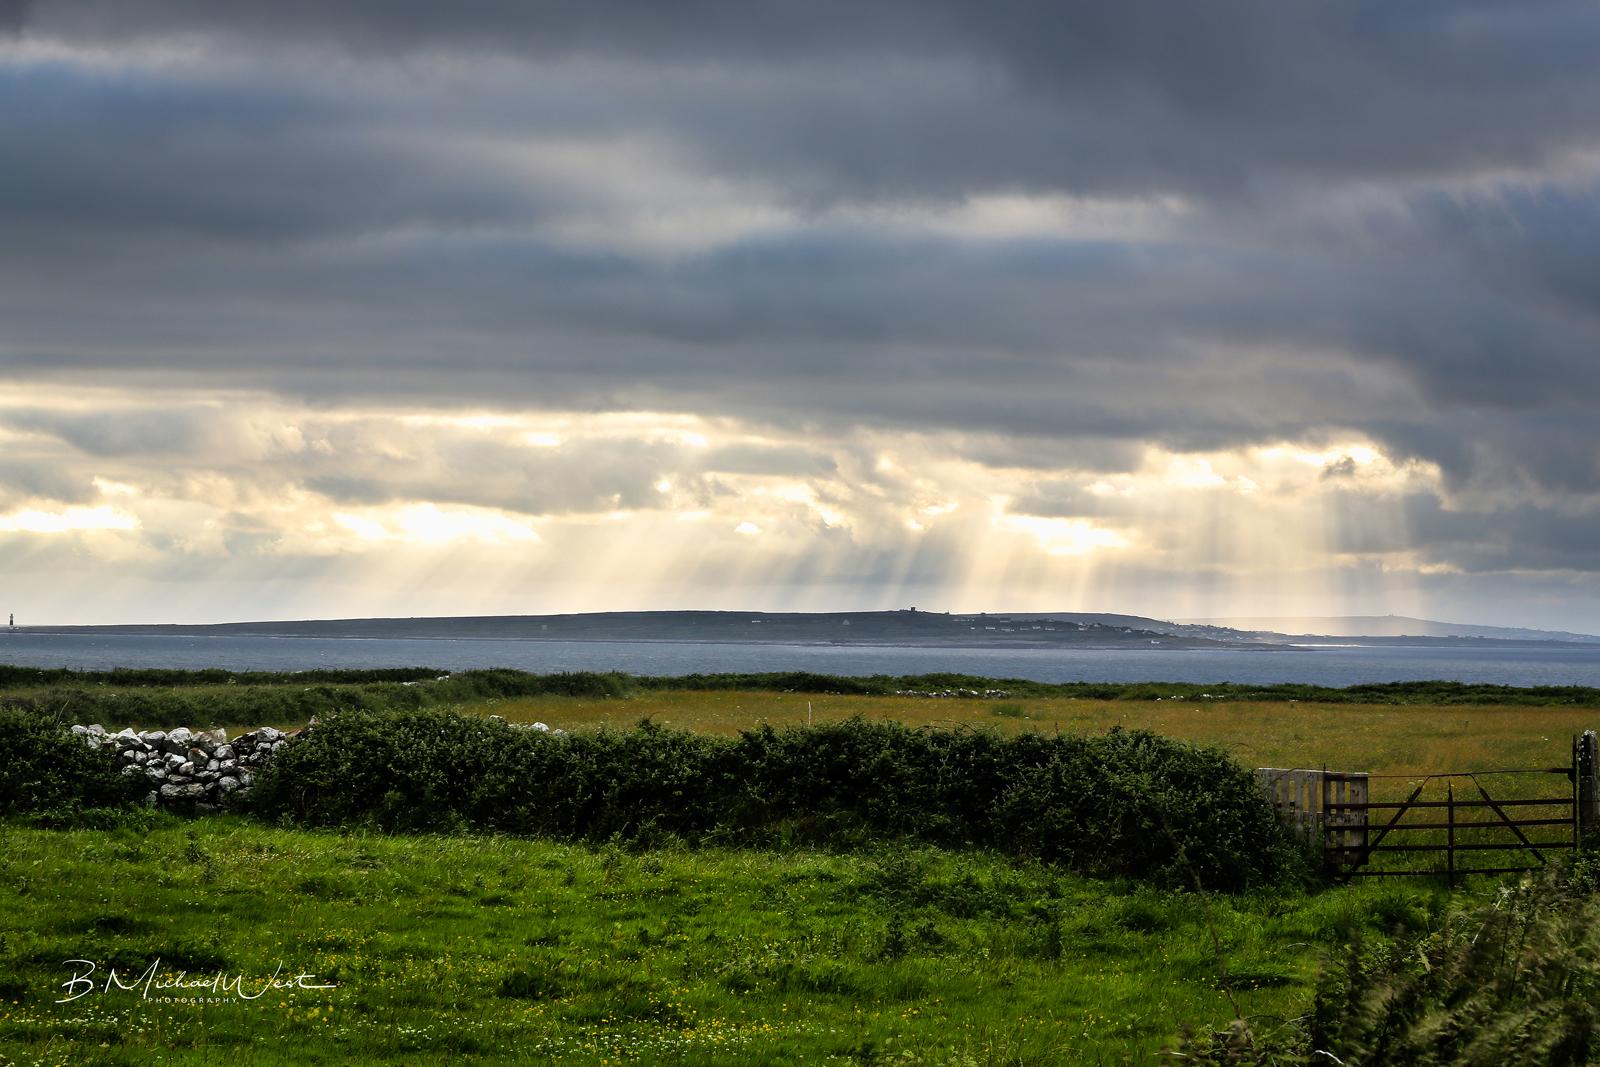 Sunset on the Aran Islands from Doolin, County Clare, Ireland